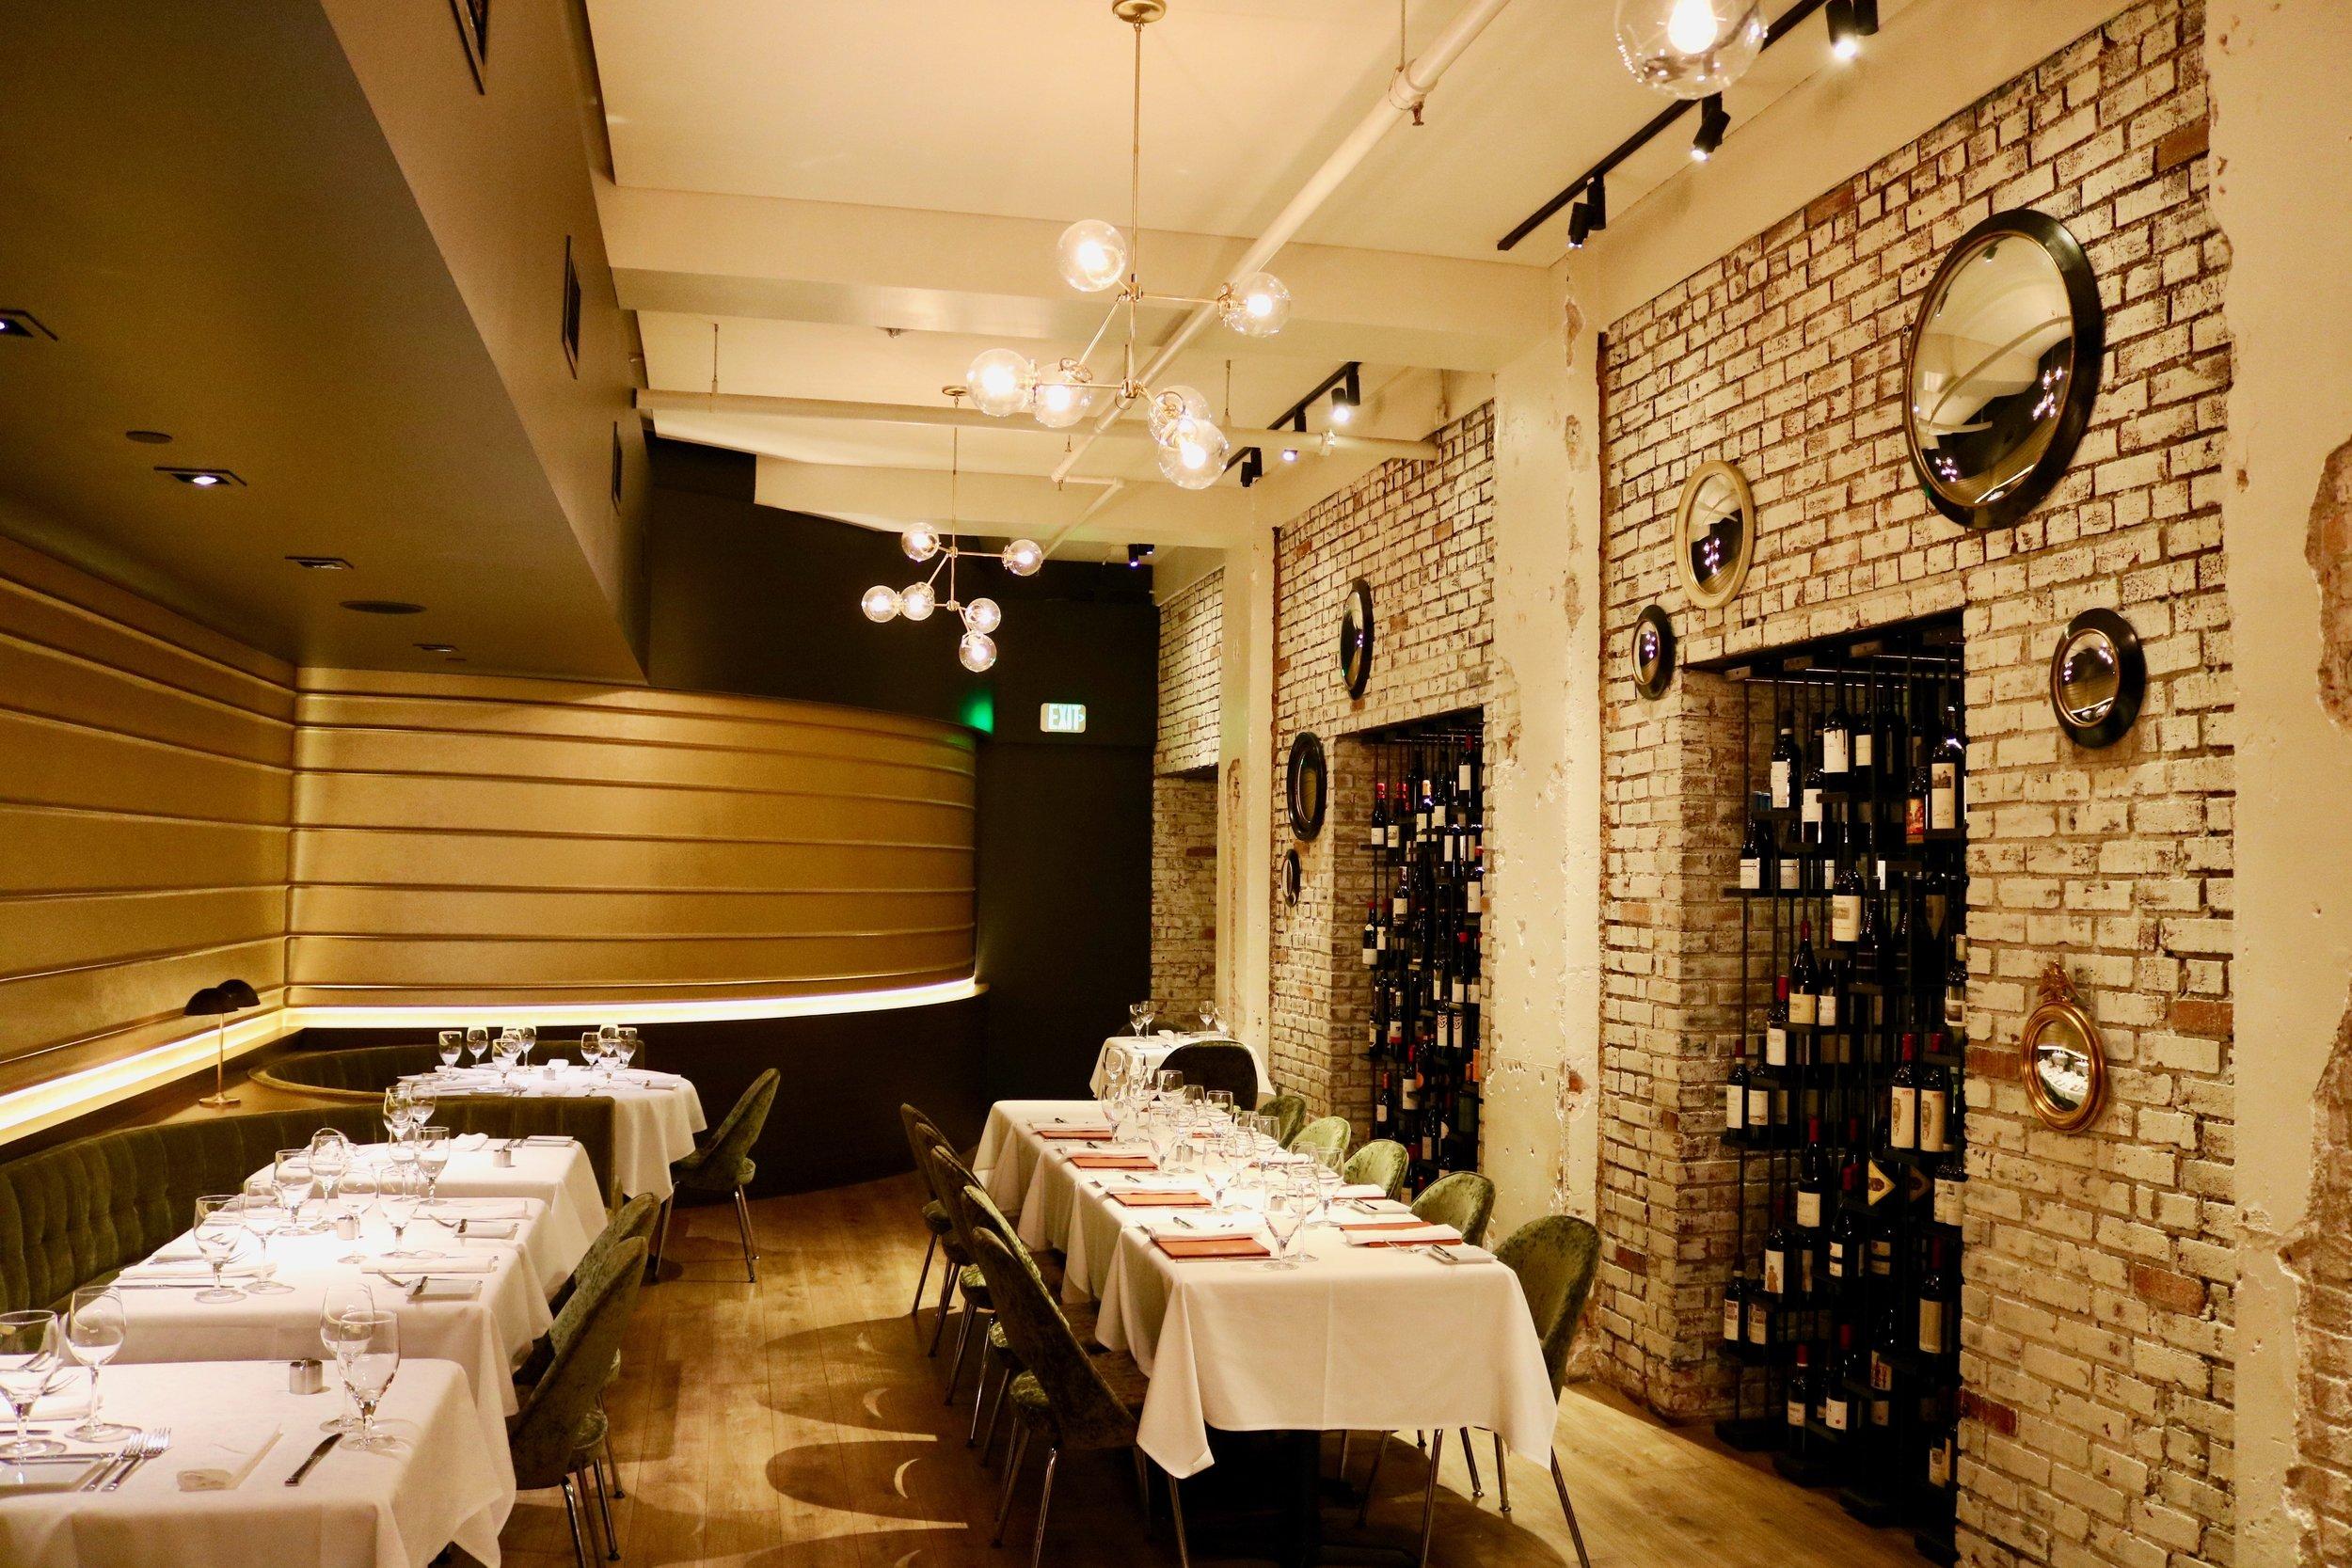 Rioja Interior Dining Room Photo by: DJB for TBOT